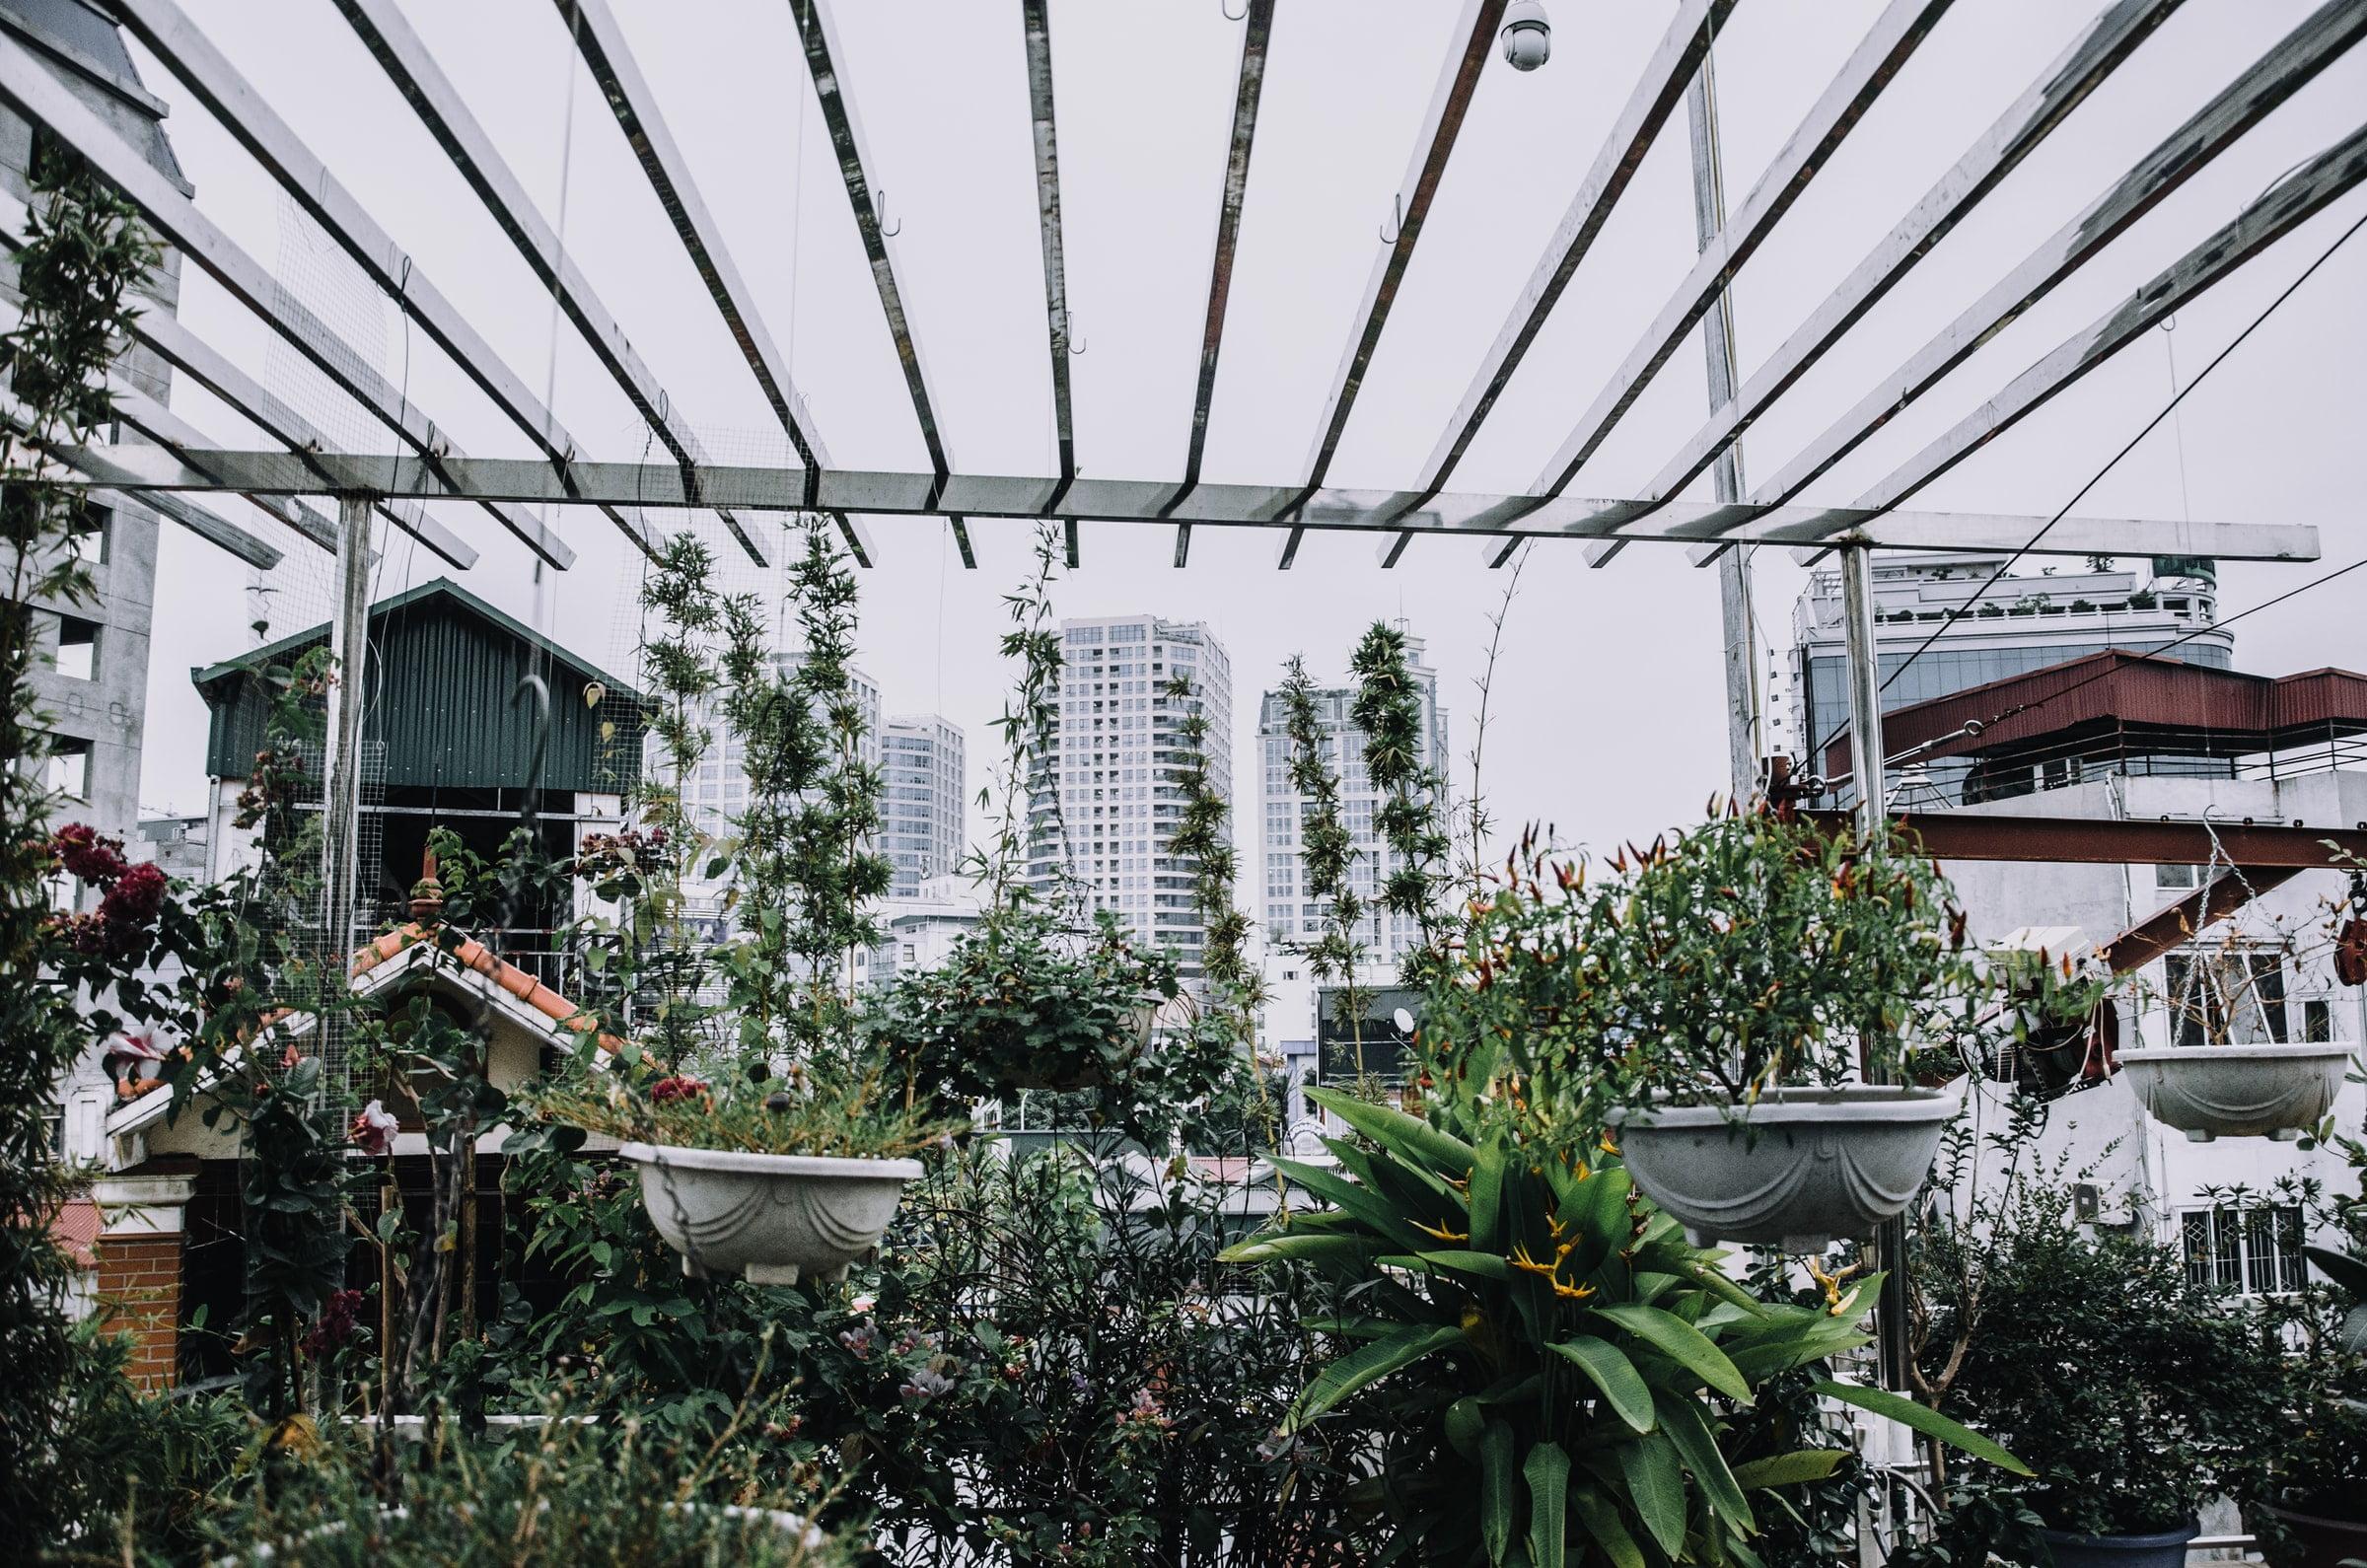 Image description. Plants on a balcony in a large city